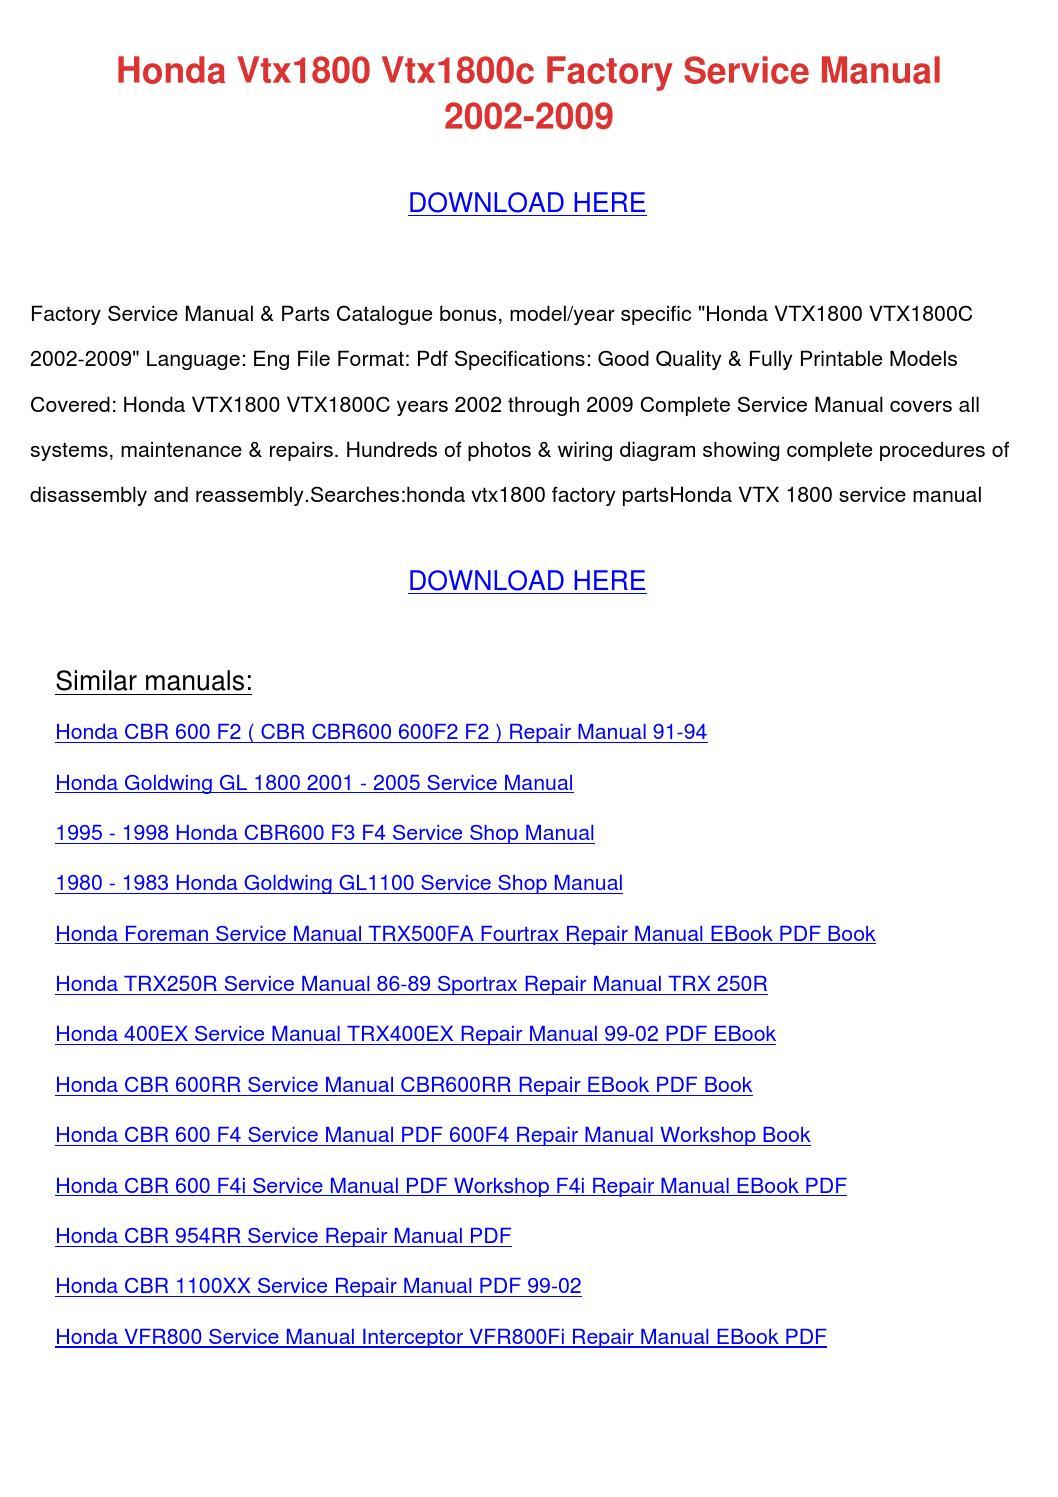 Honda Vtx1800 Vtx1800c Factory Service Manual by